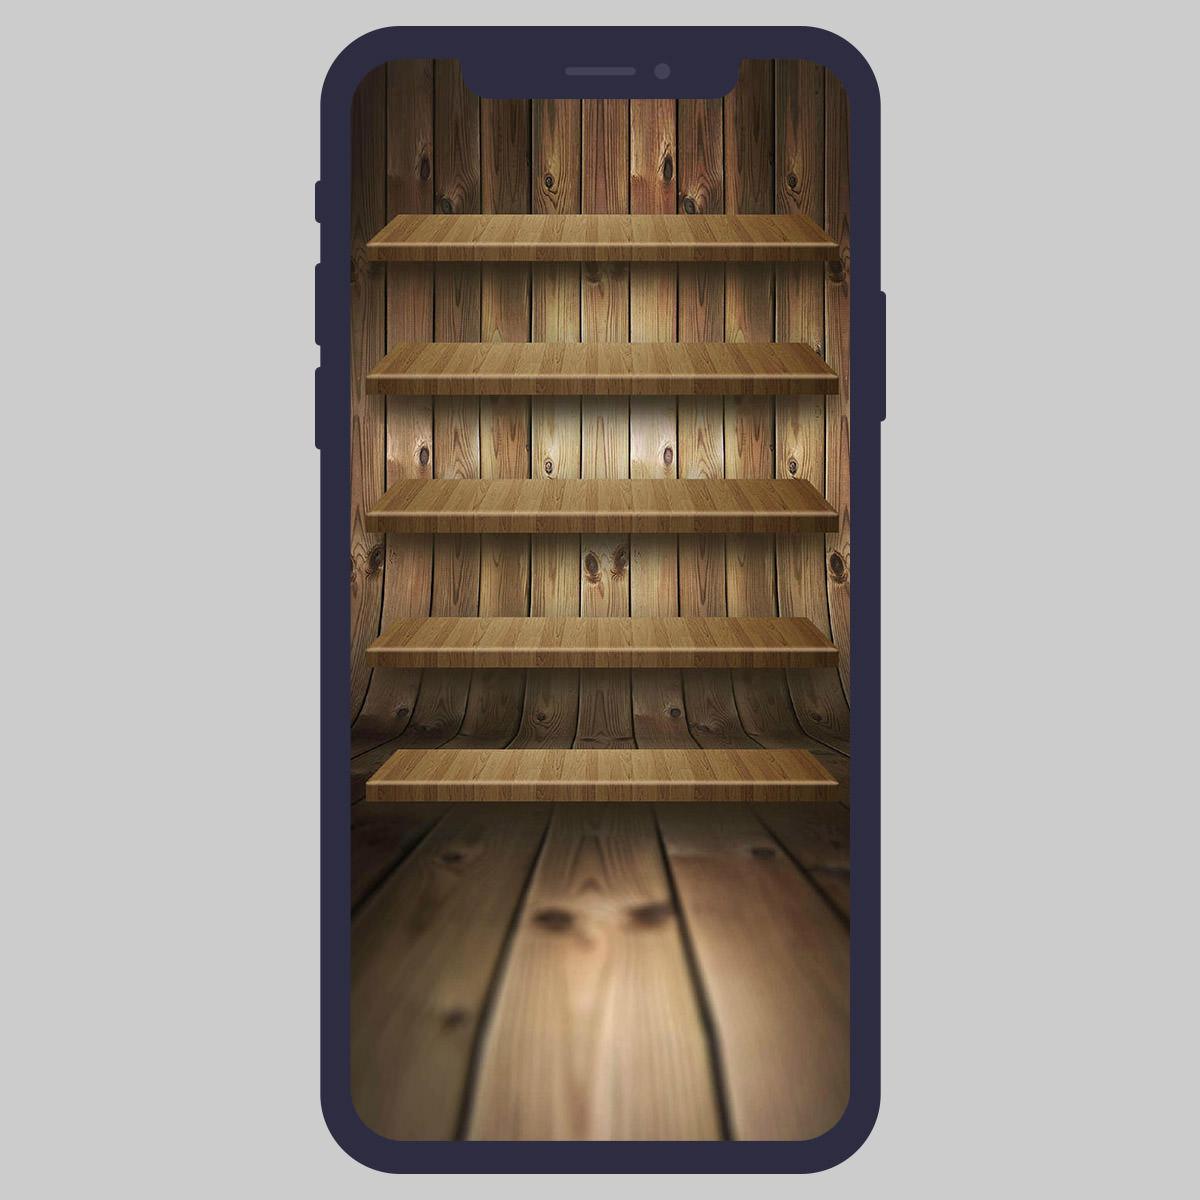 iphone shelves wallpaper